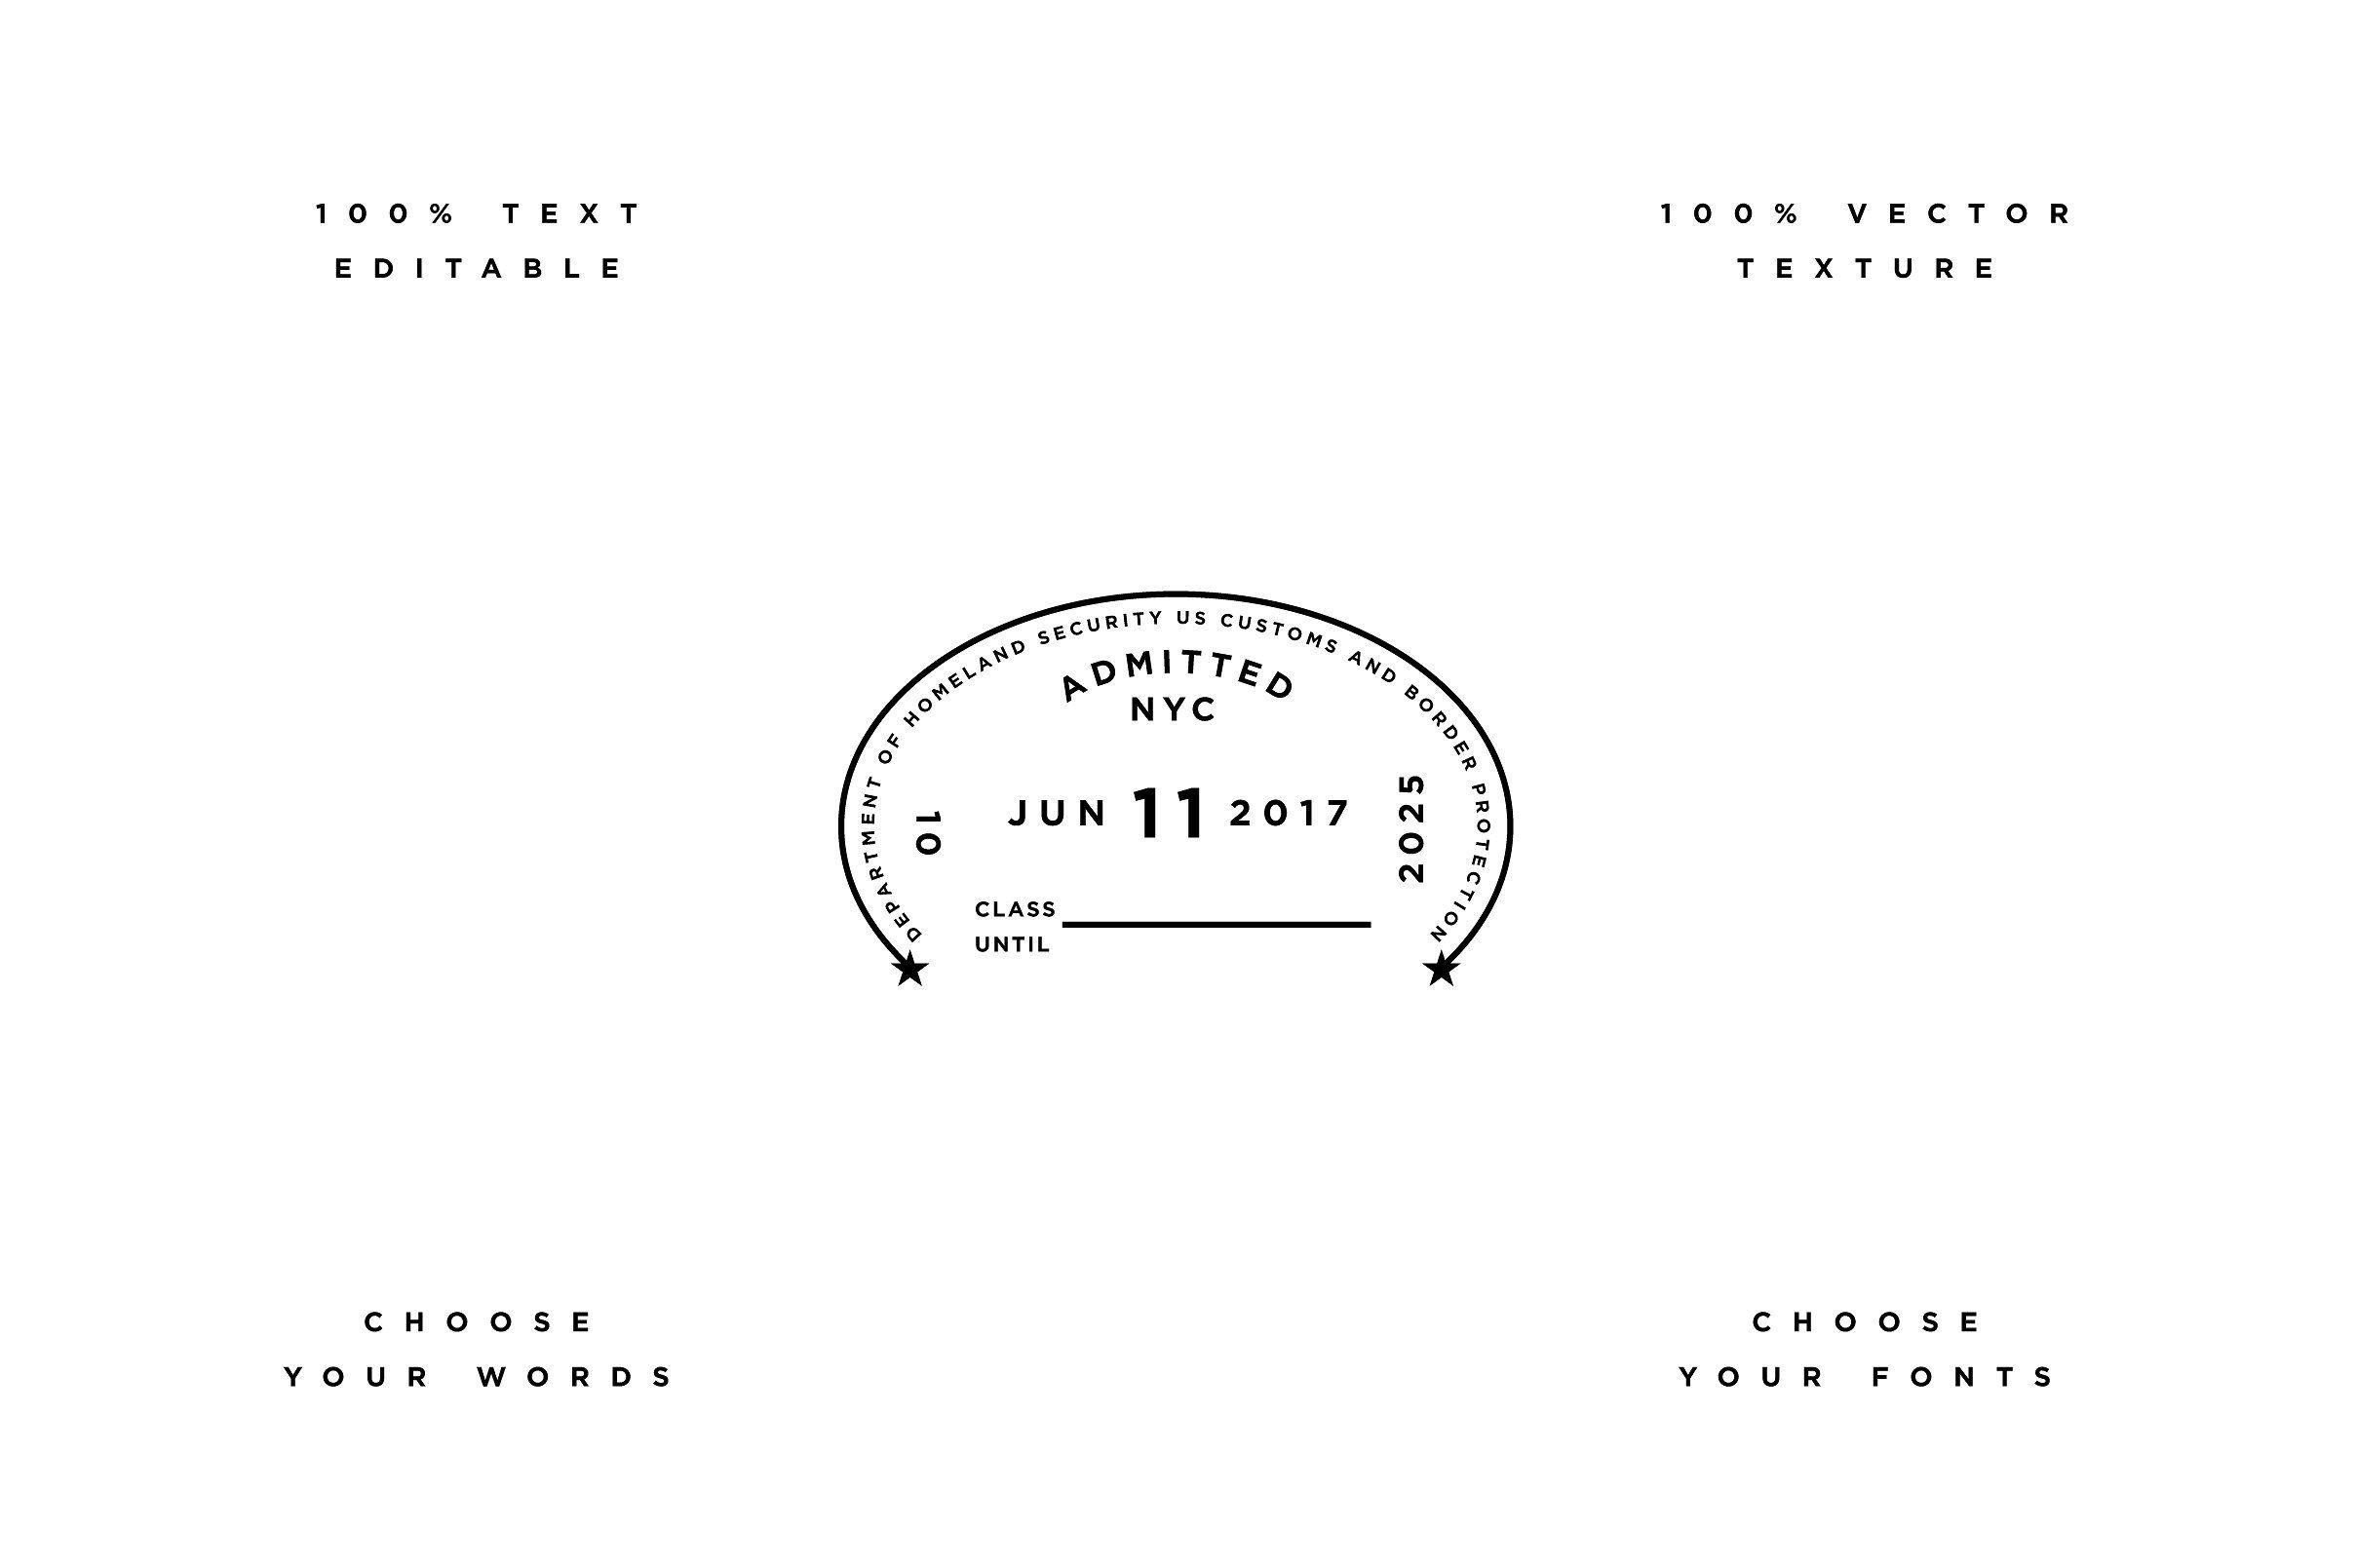 Passport Template Editable Texture Text Crafted Passport